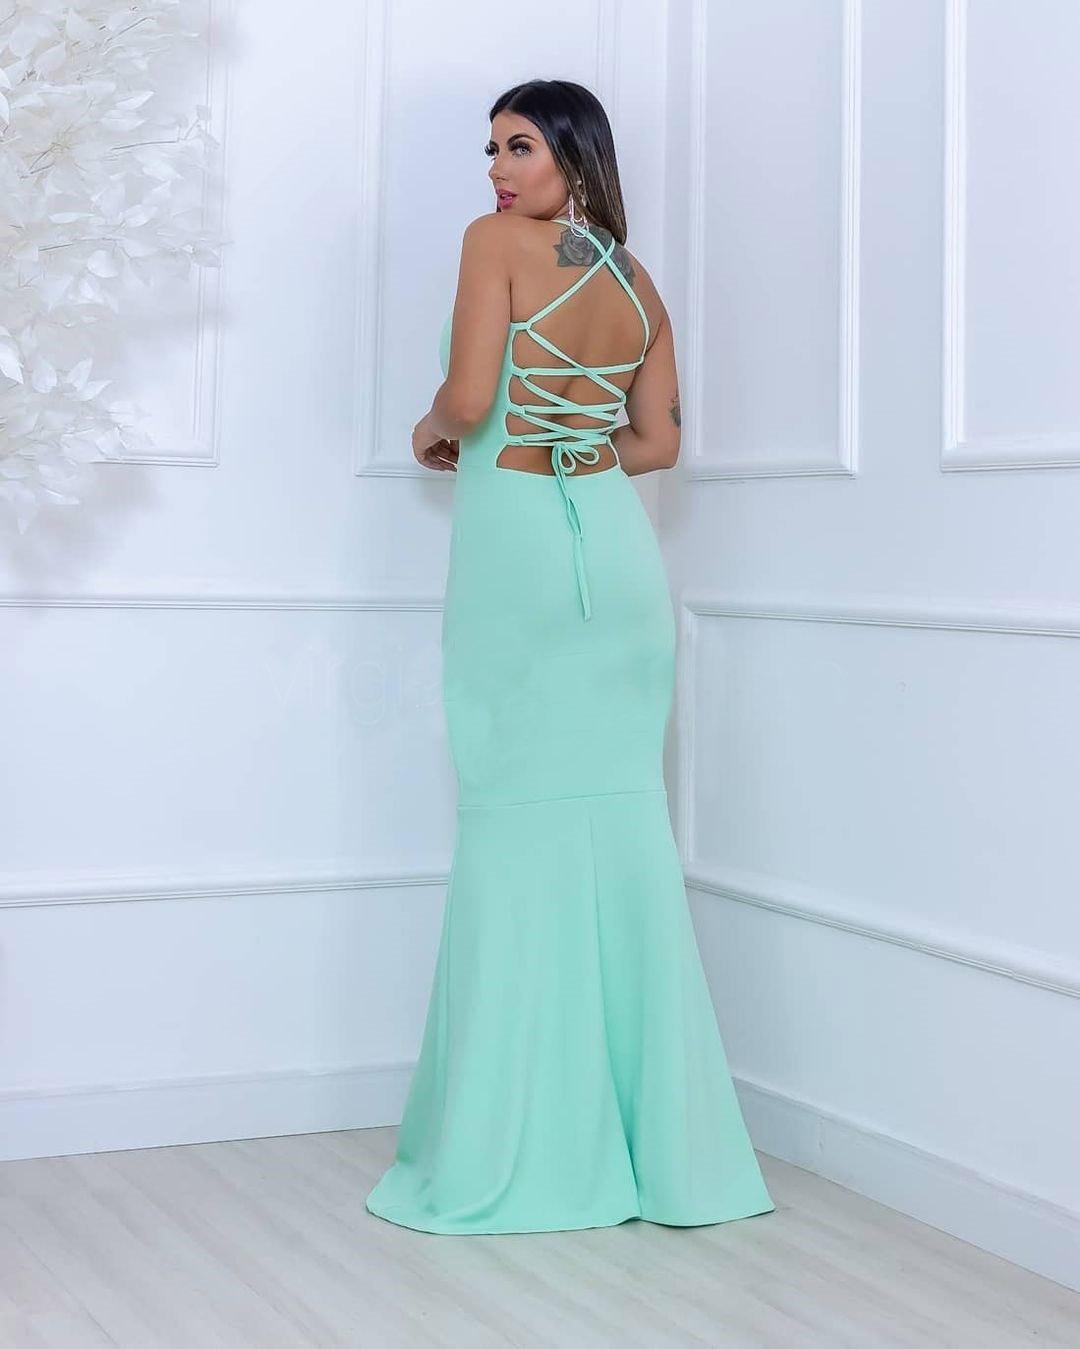 Vestido de Festa Longo decote trançado Verde Tiffany